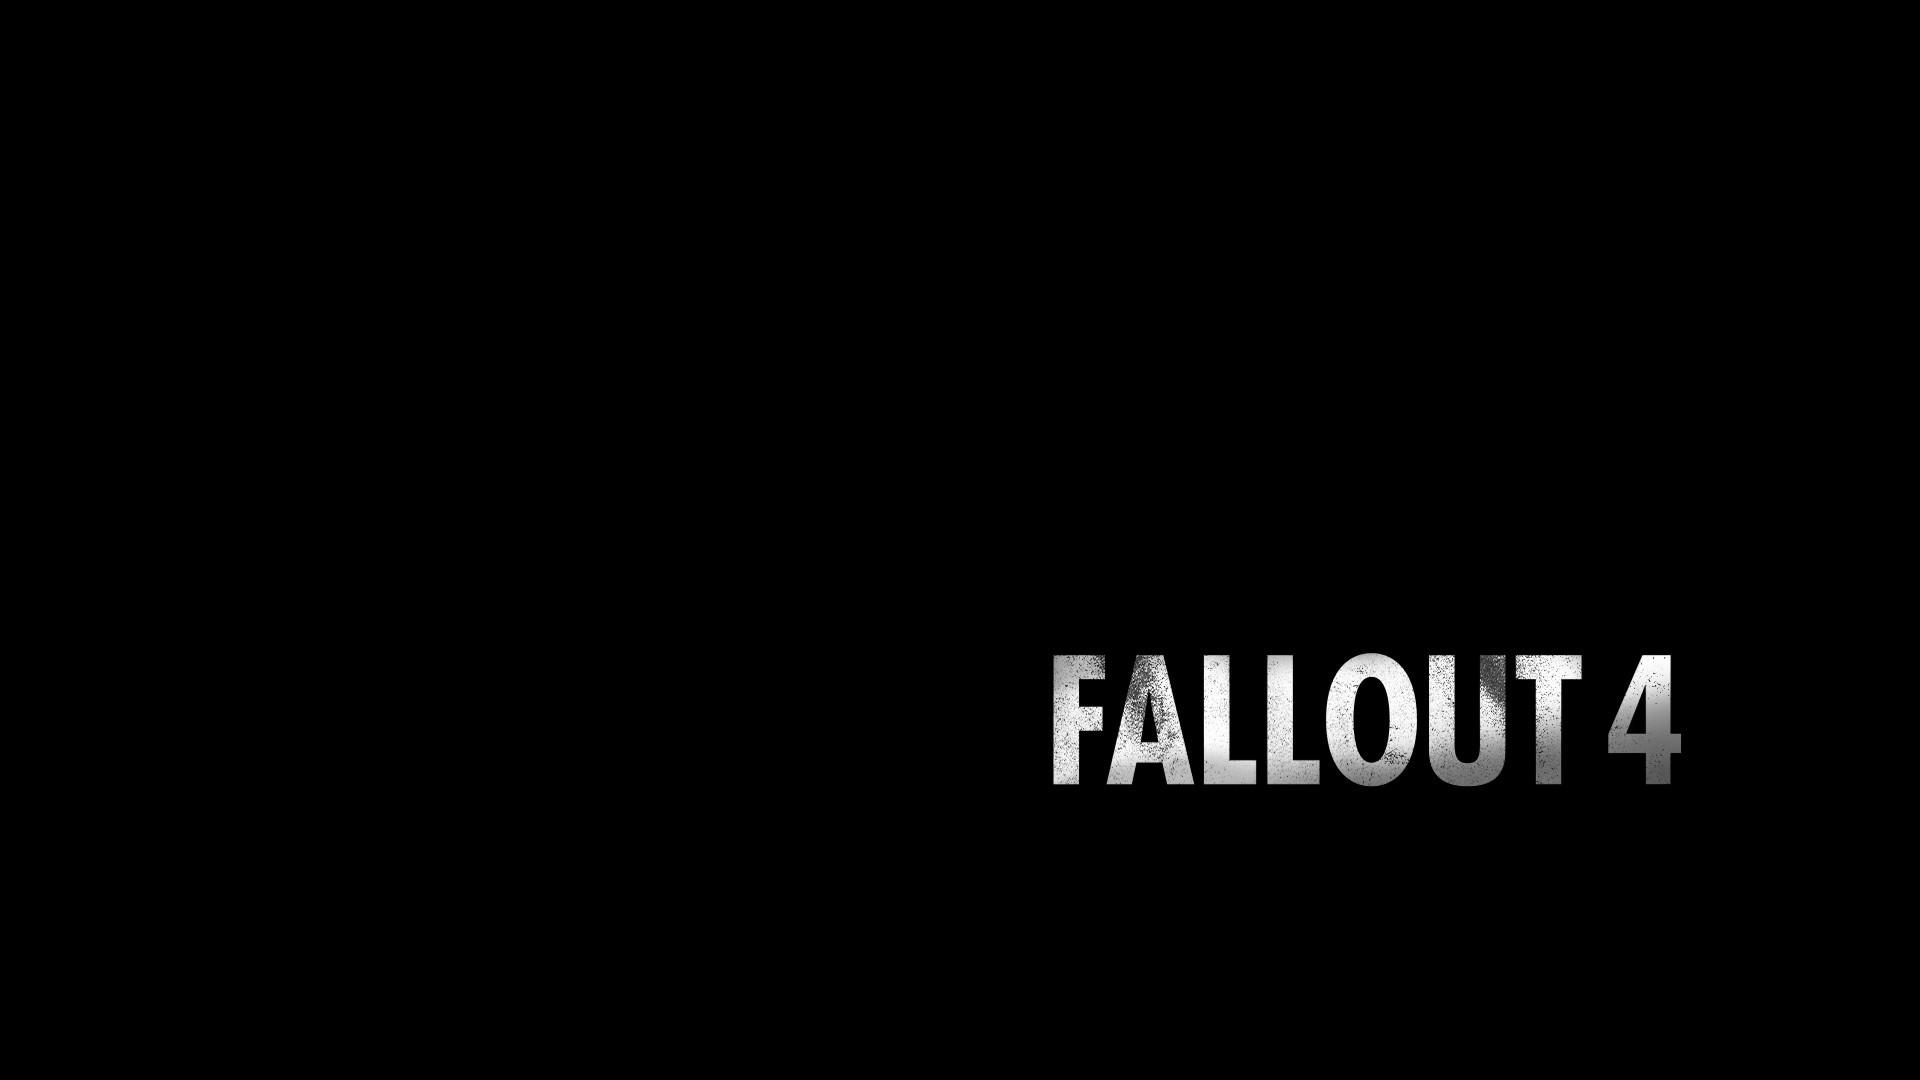 Cool Wallpaper Logo Fallout 4 - fallout-4-logo-qhd  You Should Have_732111.jpg